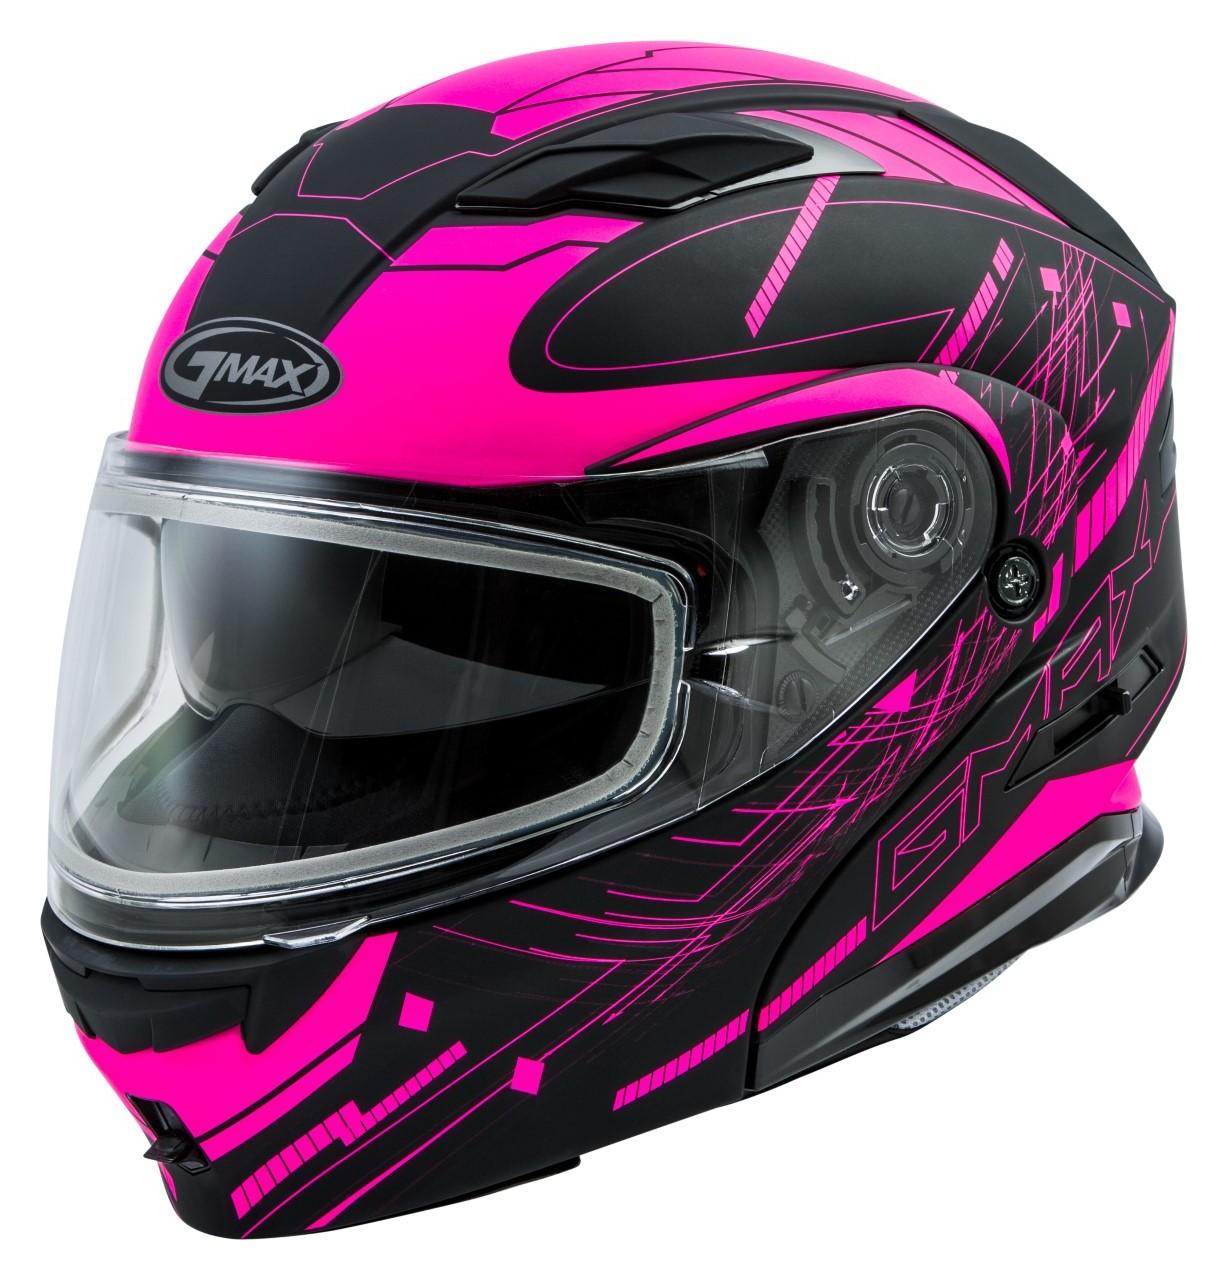 gmax_helmets_md01_snow_modular_wired_col